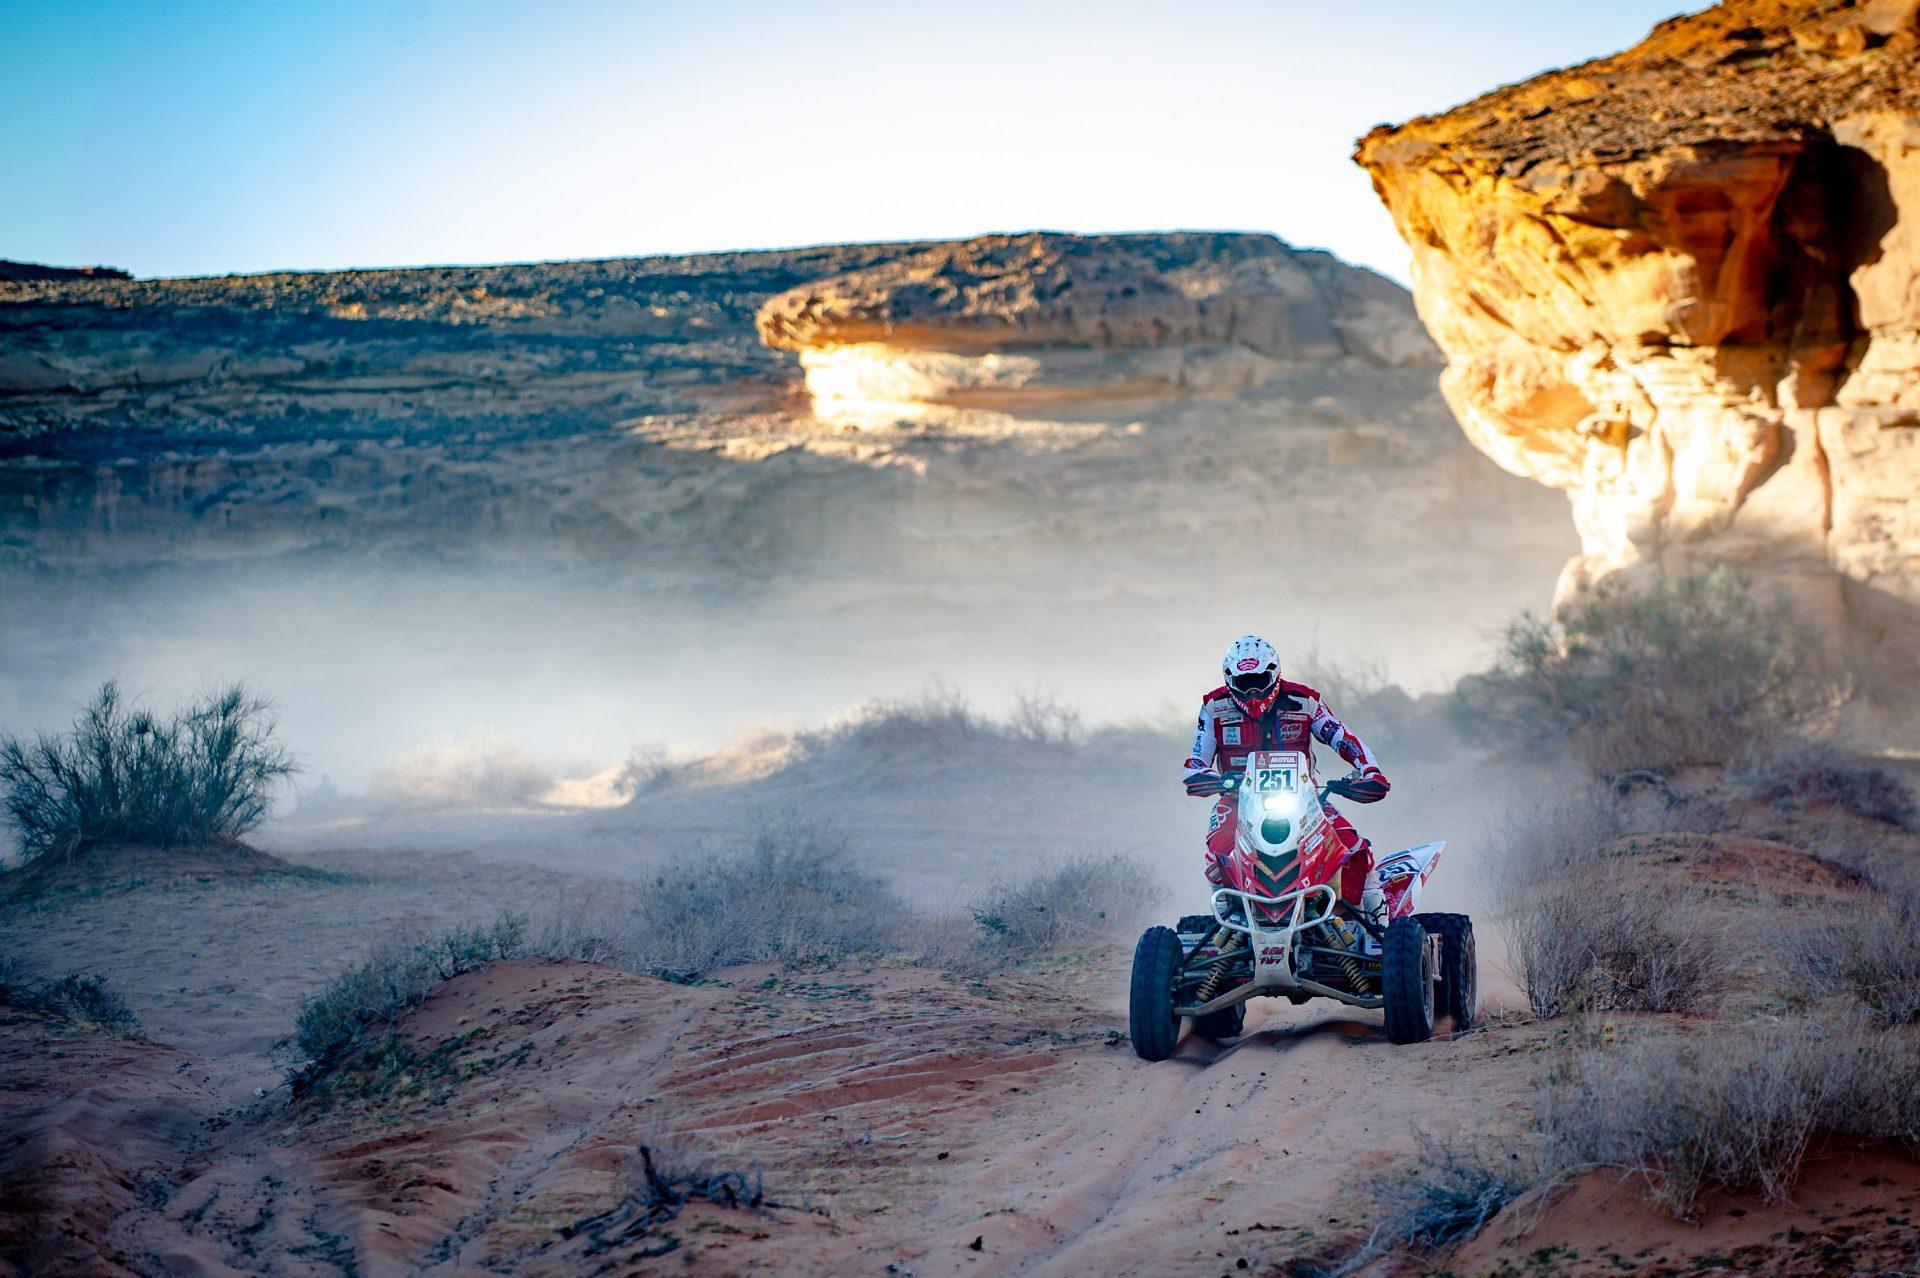 Etap V rajdu Dakar 2020. Rafał Sonik